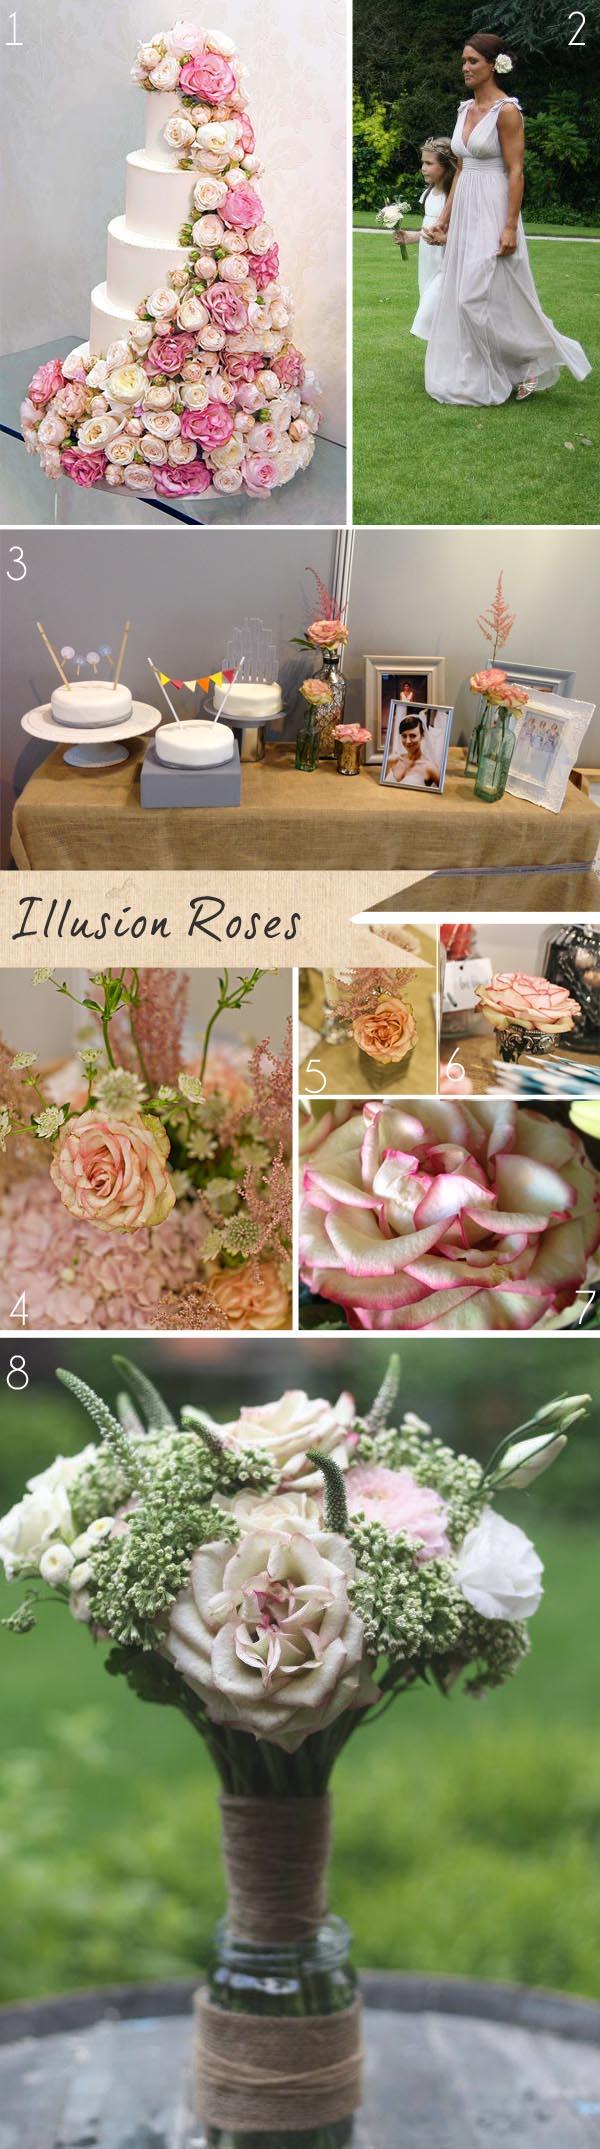 illusion roses wedding flowers